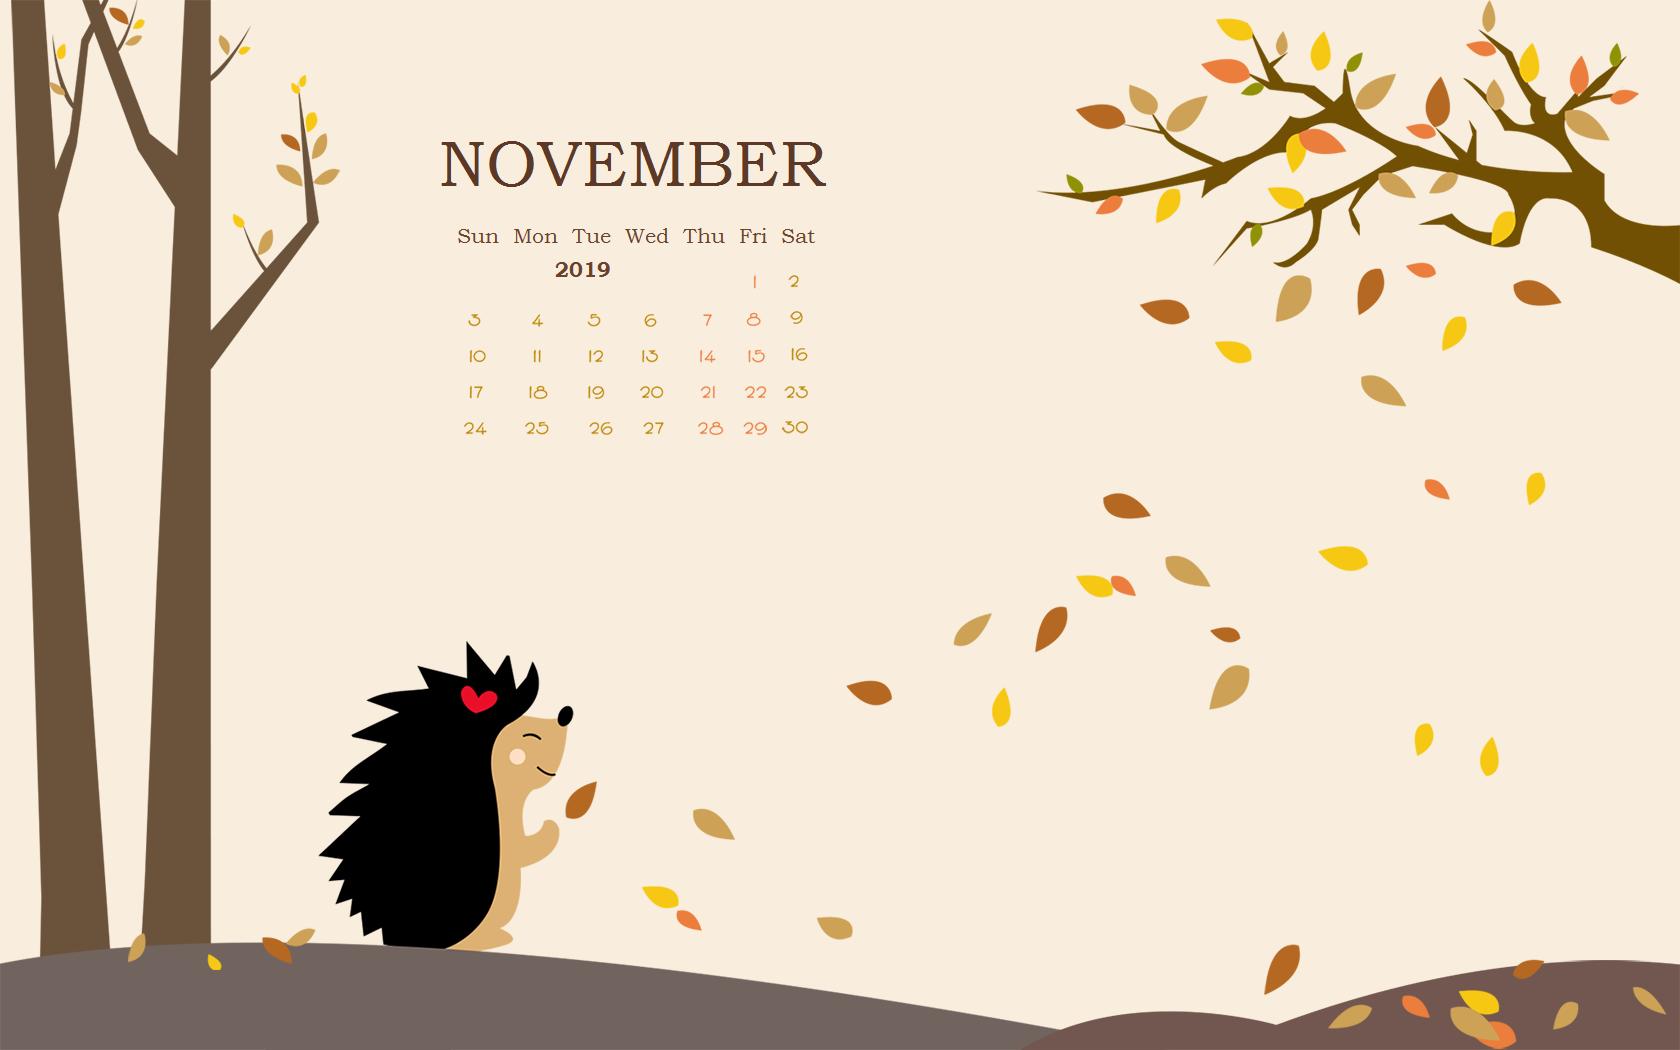 Floral November 2019 Calendar Wallpaper For Desktop